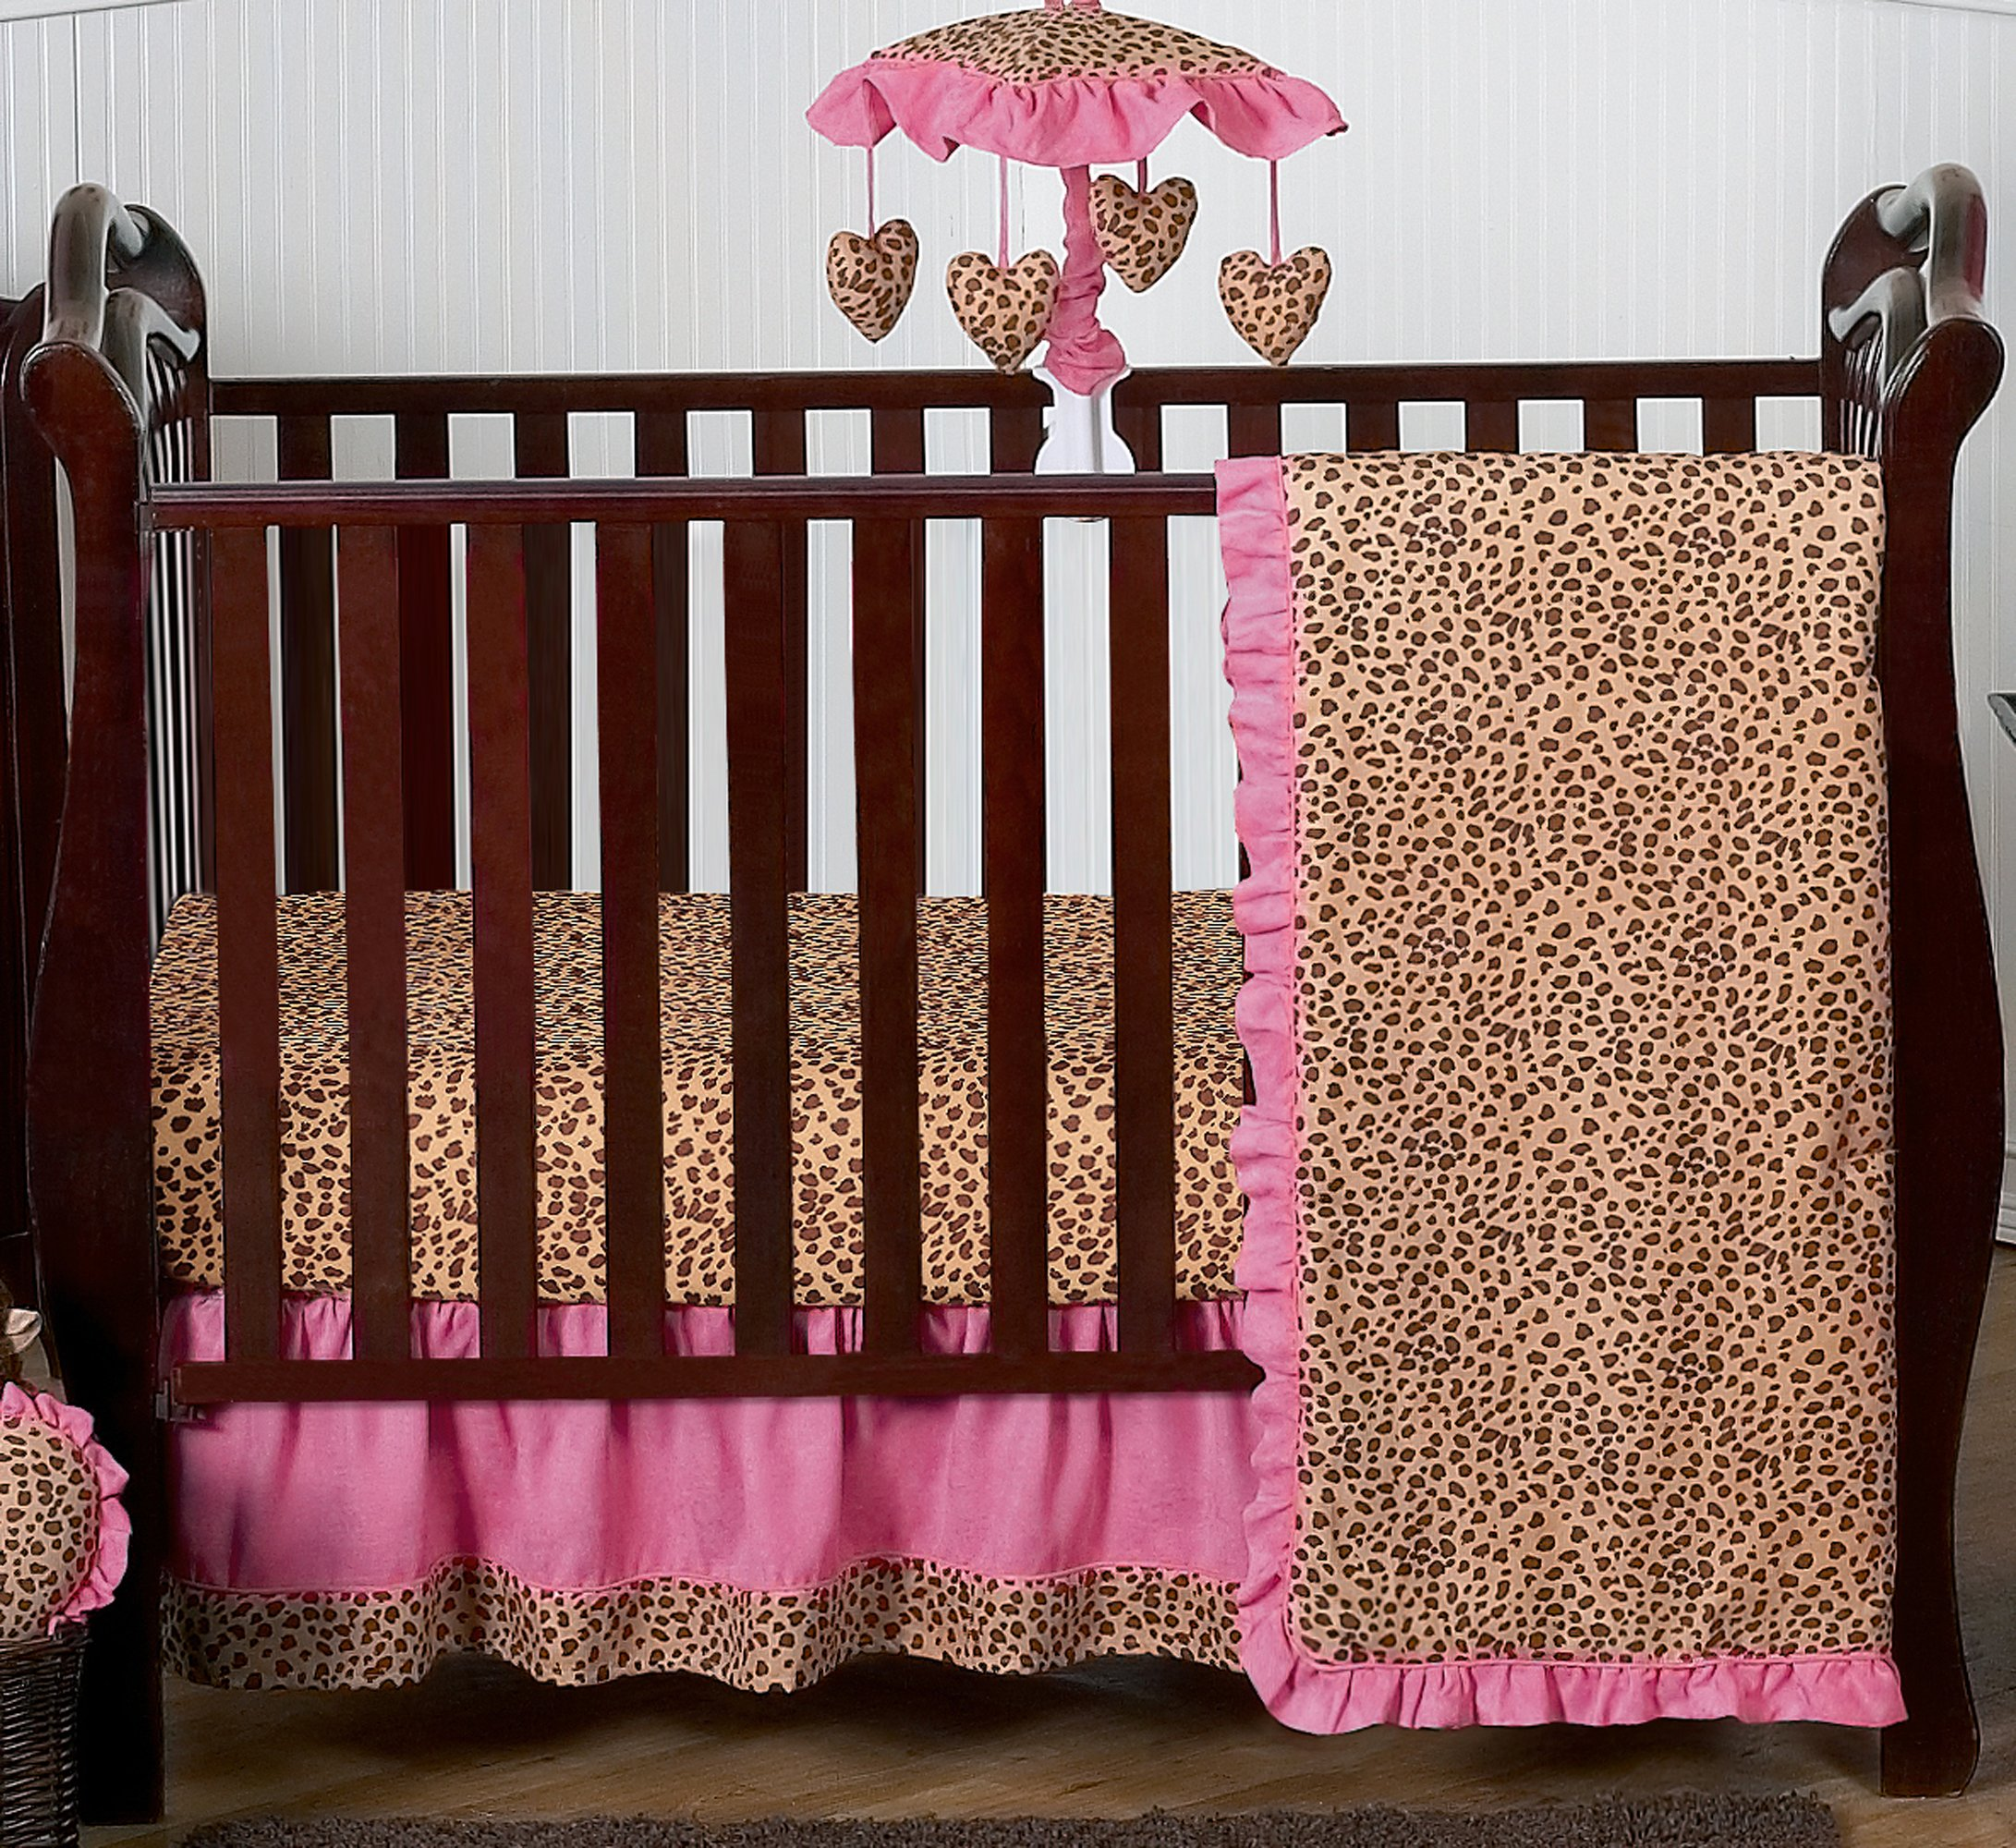 sweet crib pin cribs designs space jojo collection bedding baby galaxy